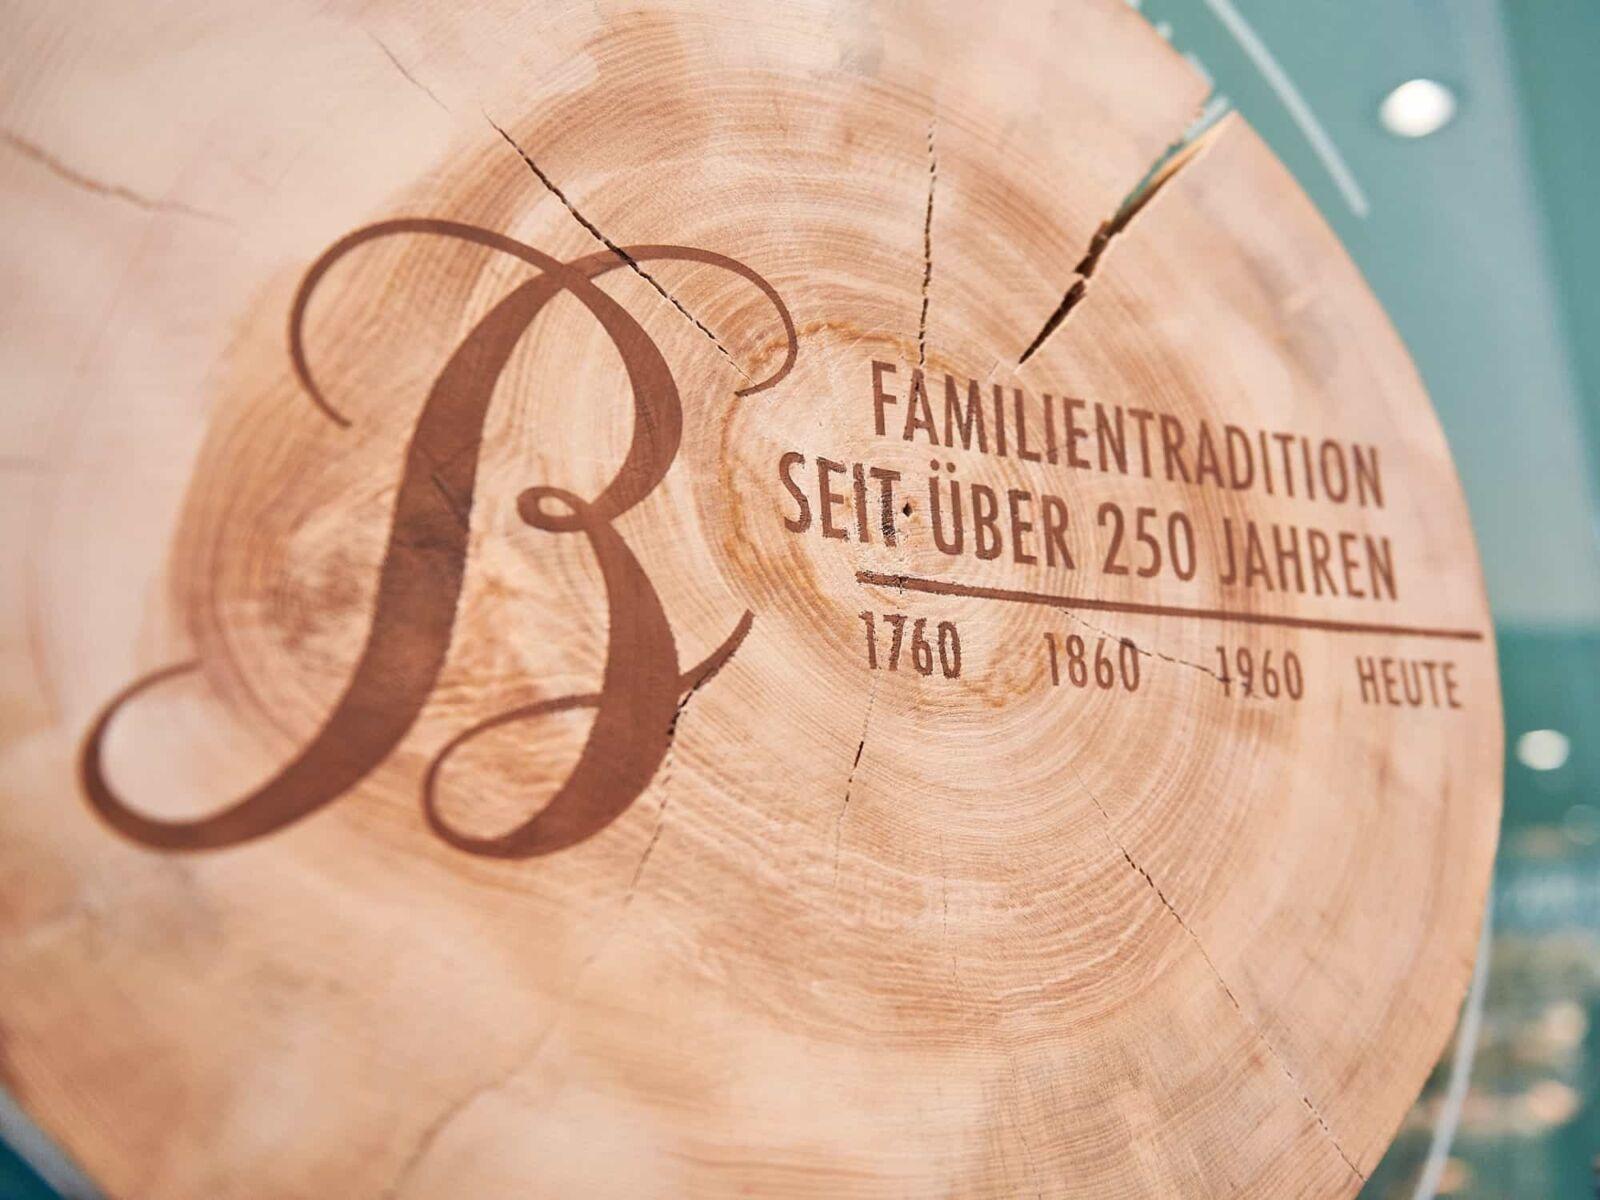 Backwerke mit 250 Jahre Familientradition